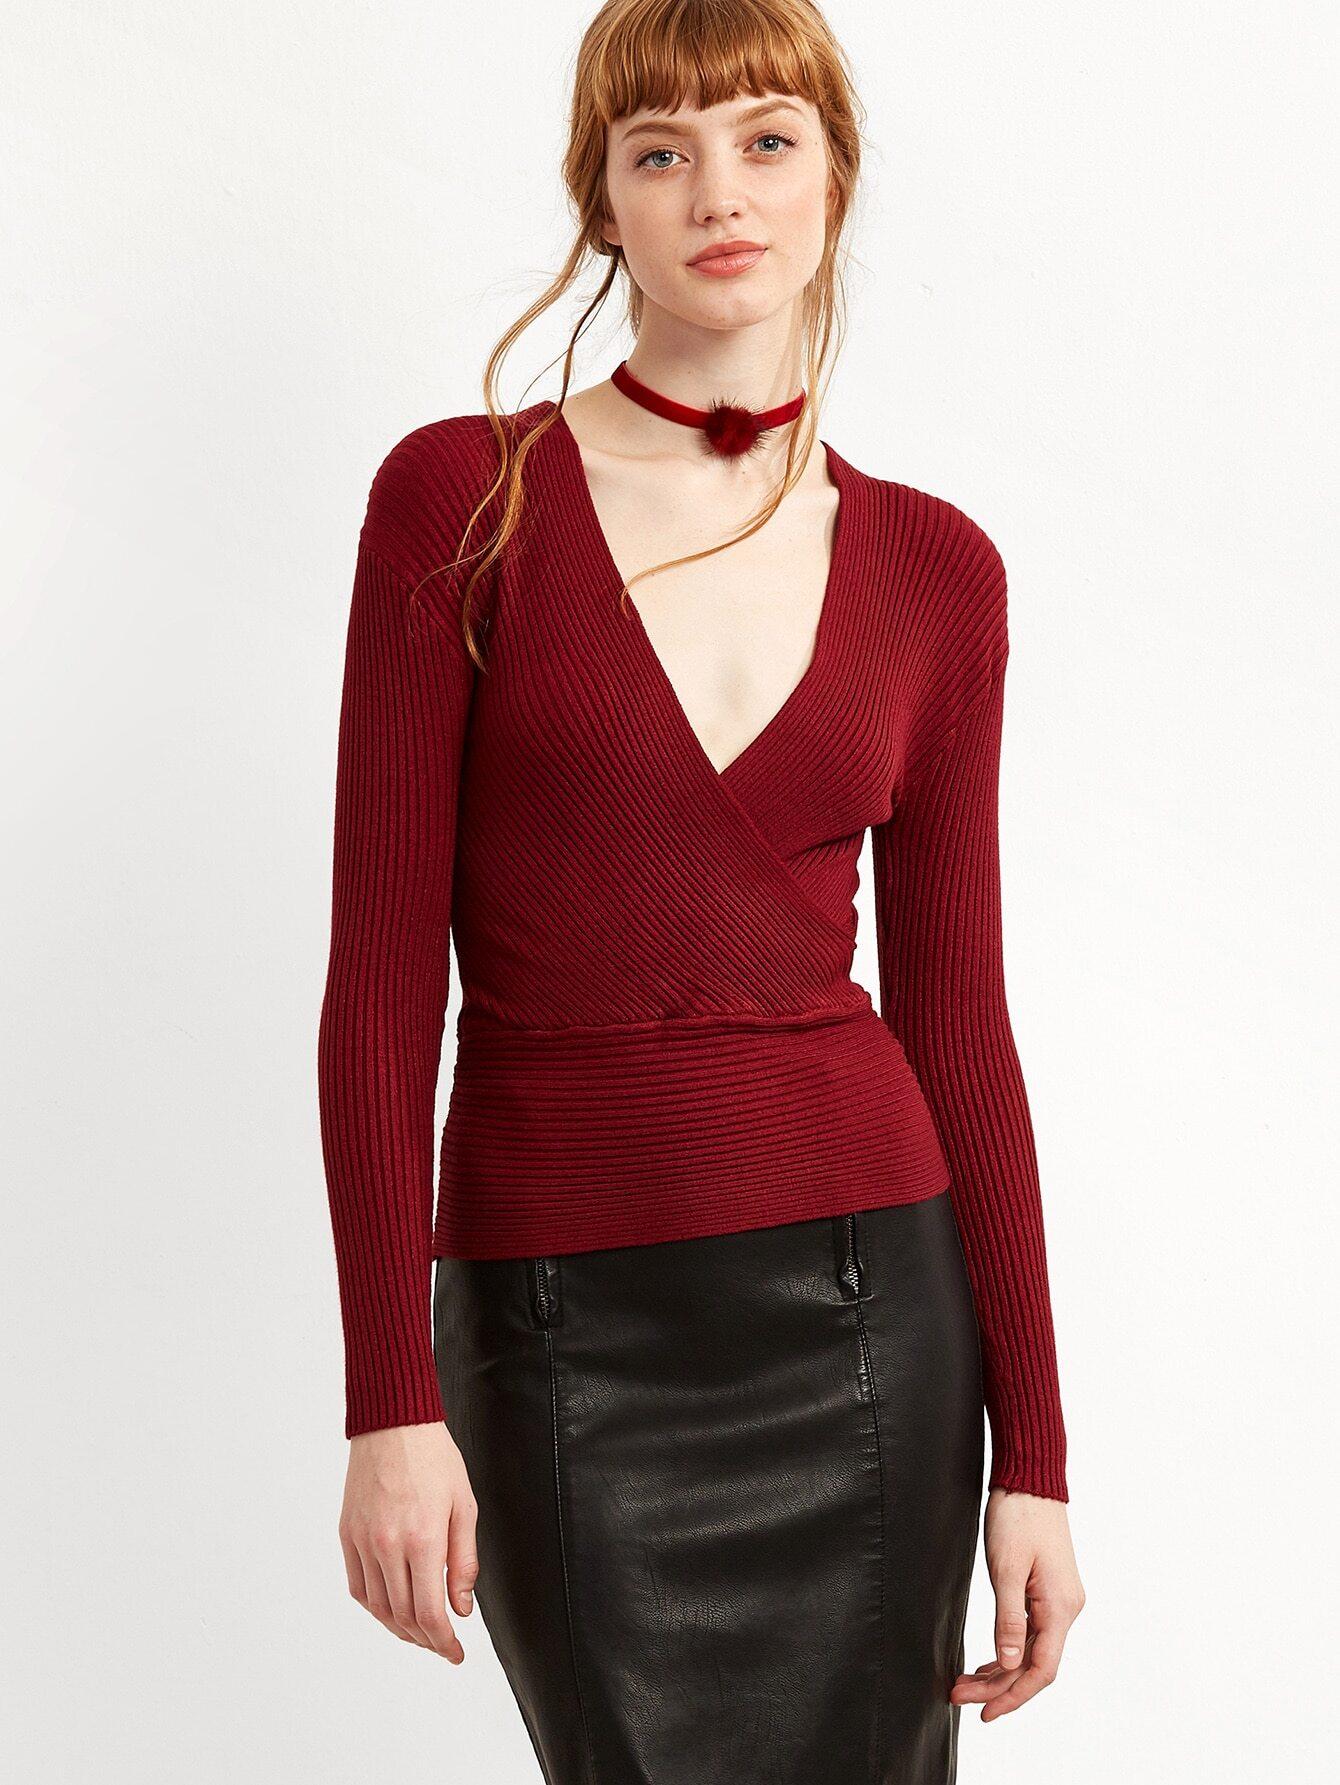 Burgundy Deep V Neck Wrap Sweater sweater160916101